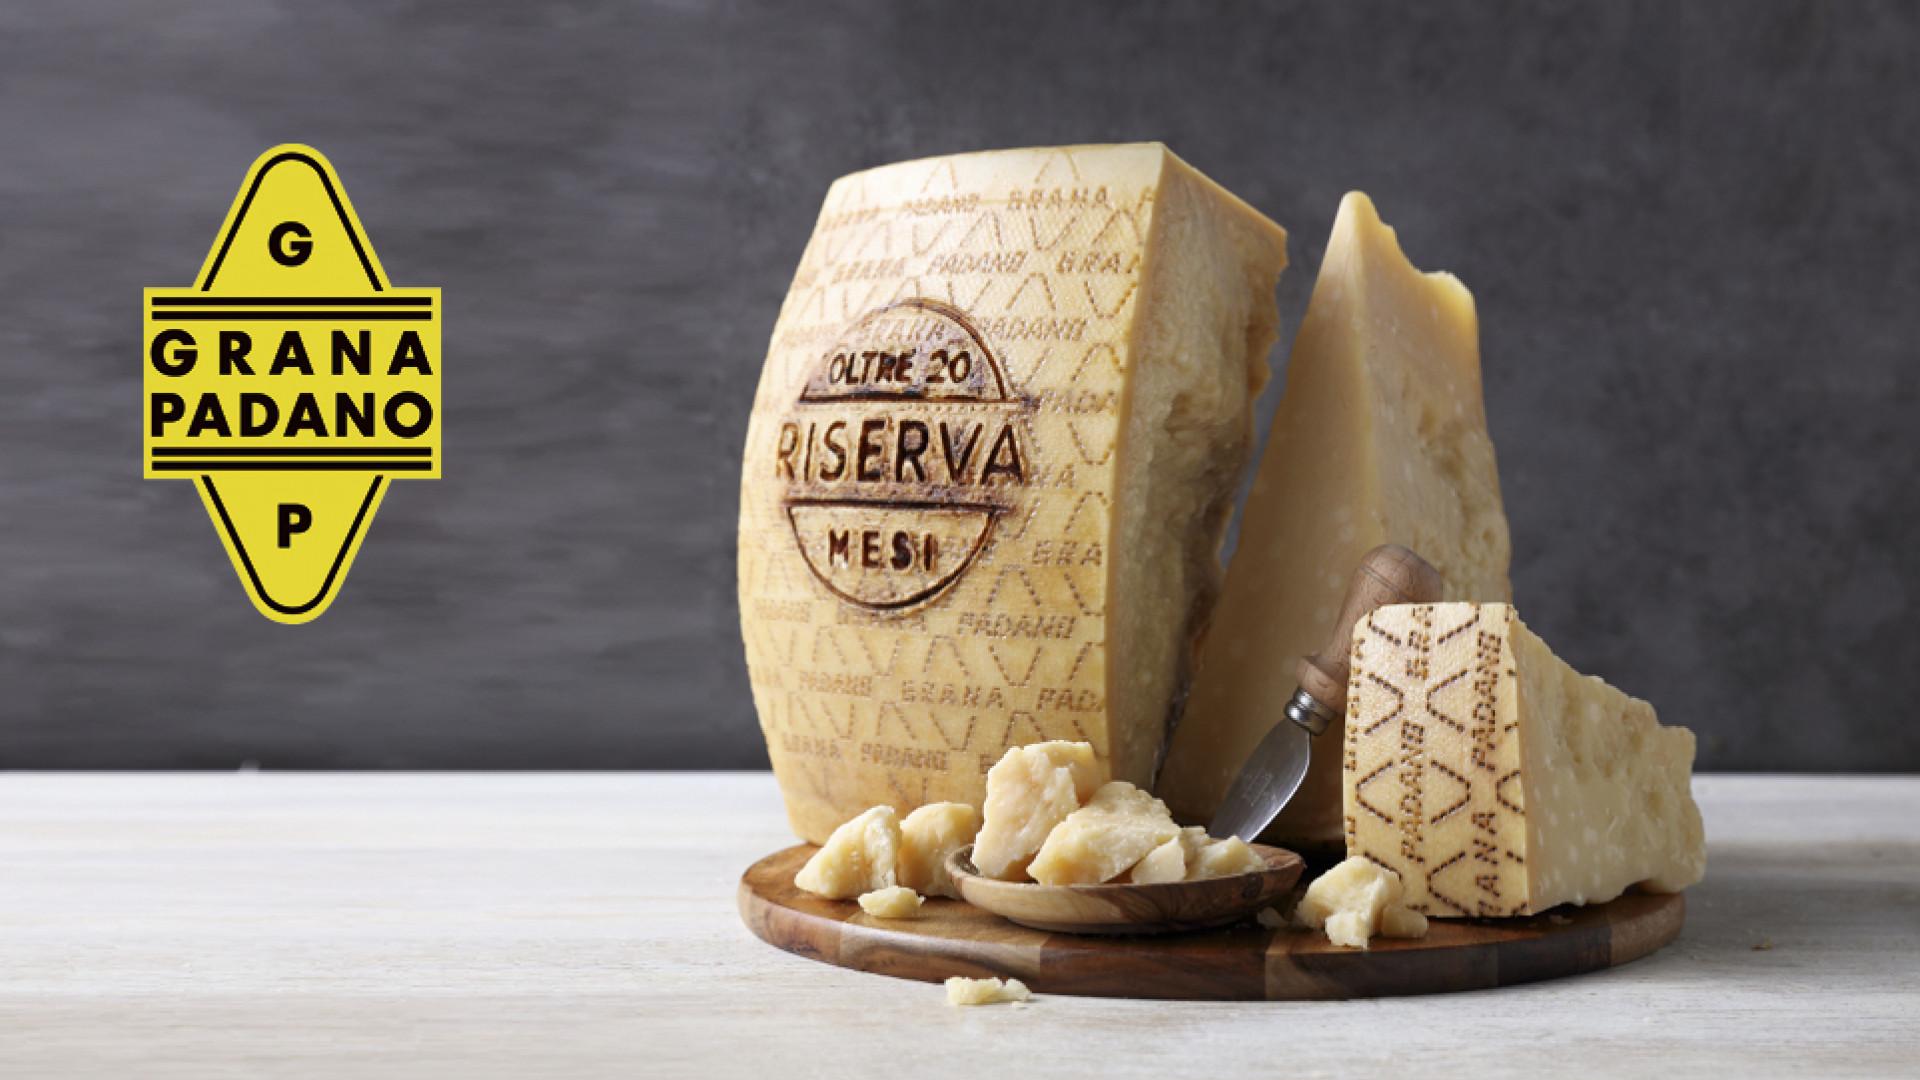 A big wheel of Grana Padano cheese